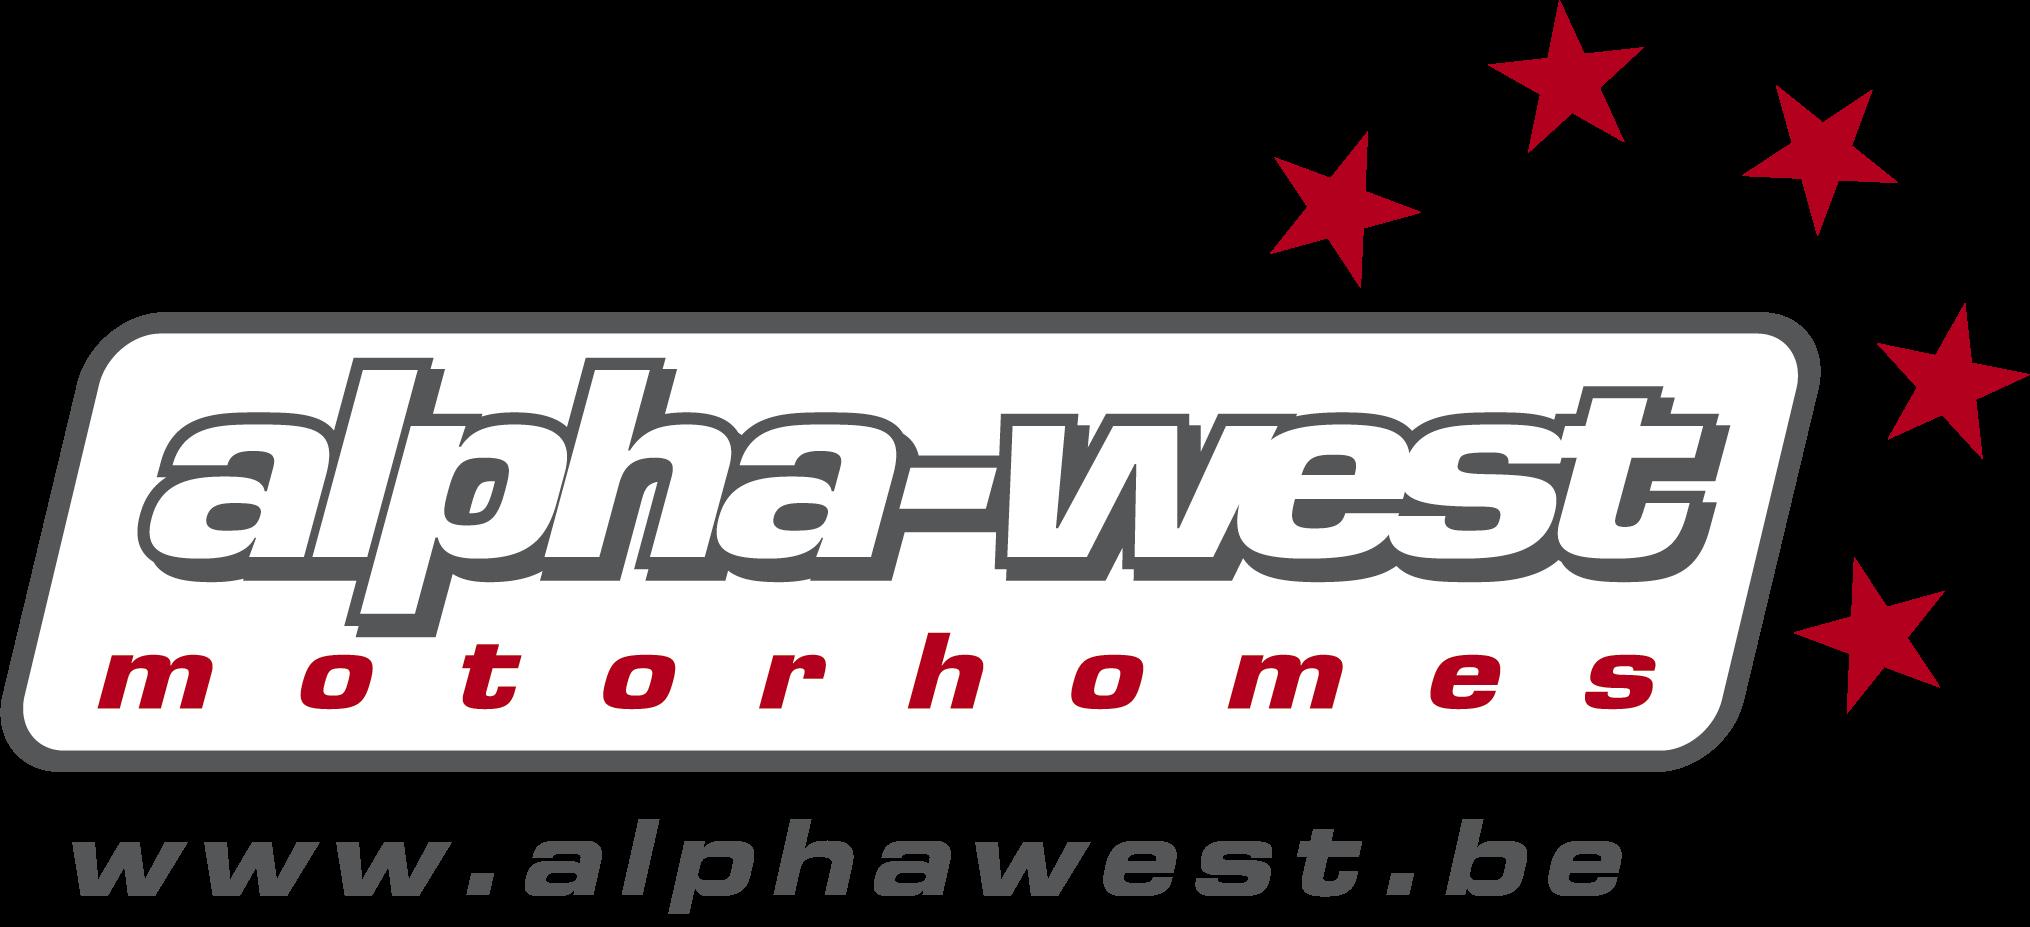 ALPHA-WEST MOTORHOMES